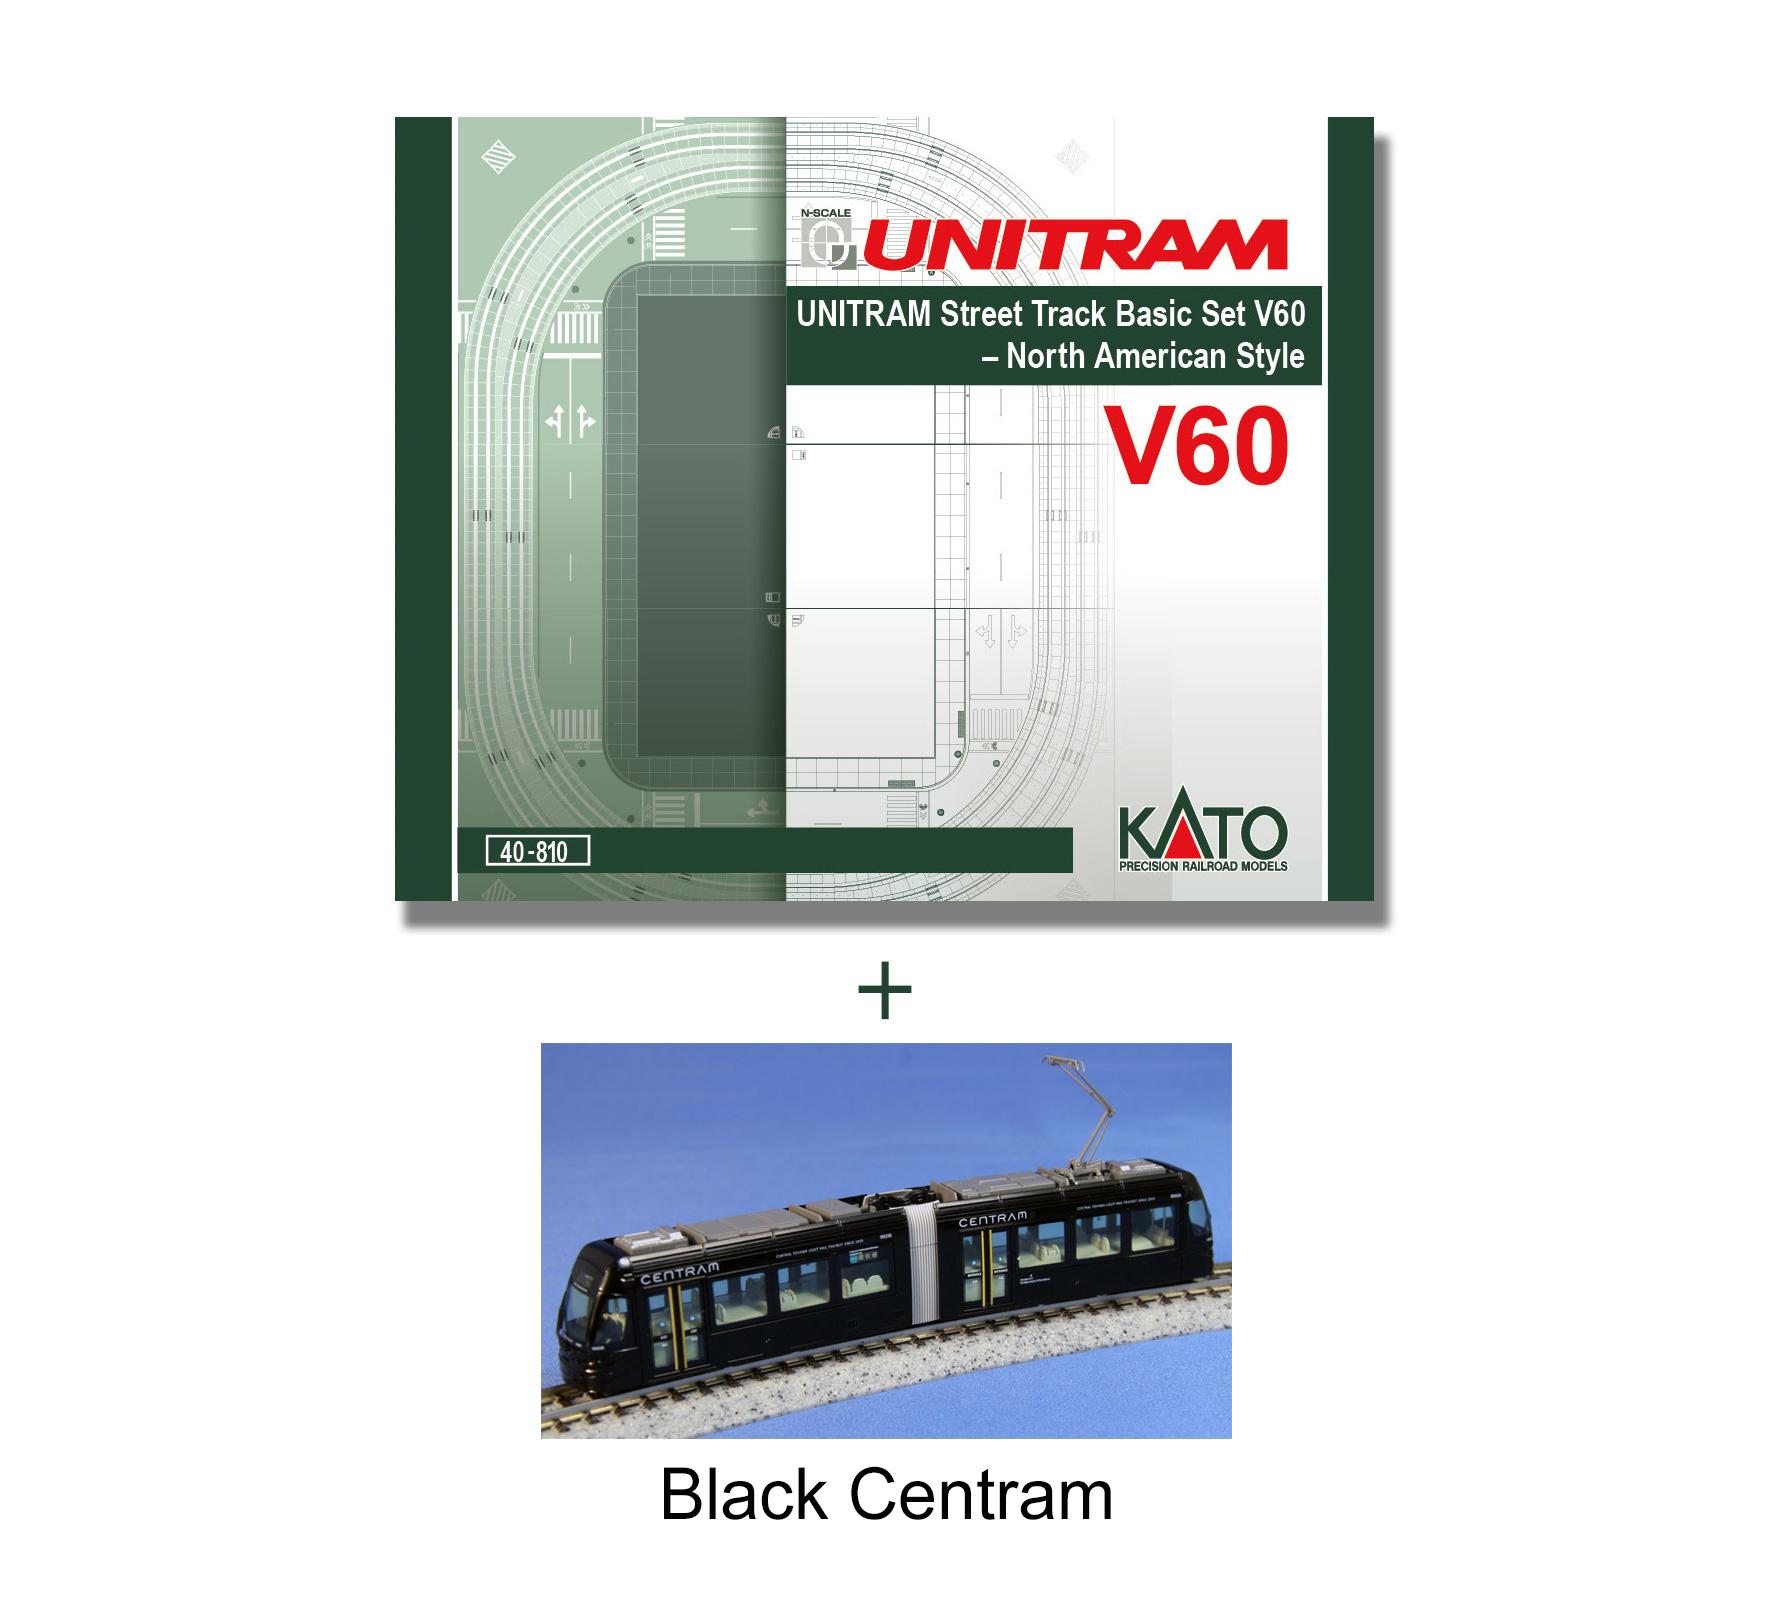 hight resolution of kato v60 unitram track set black centram bundle 40 810 4 jpg